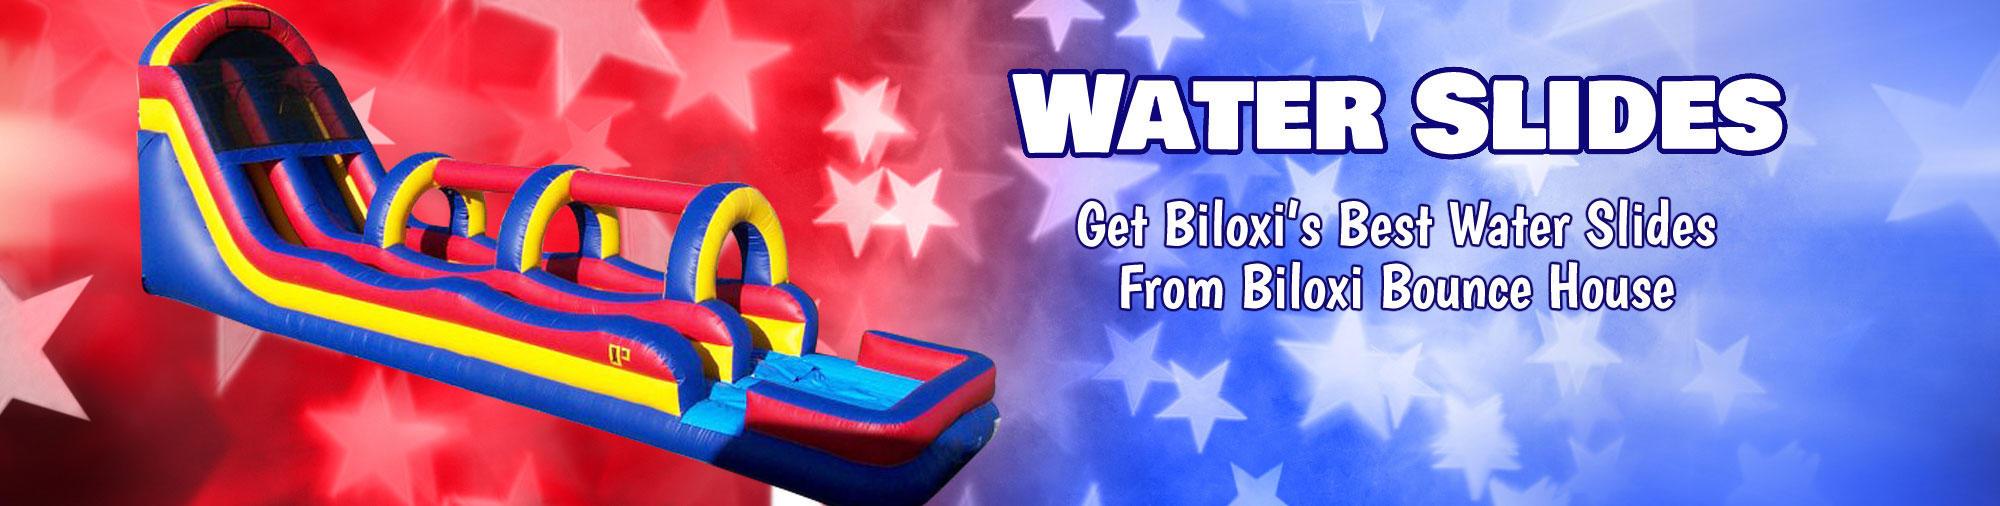 order by date waterslides biloxi bounce